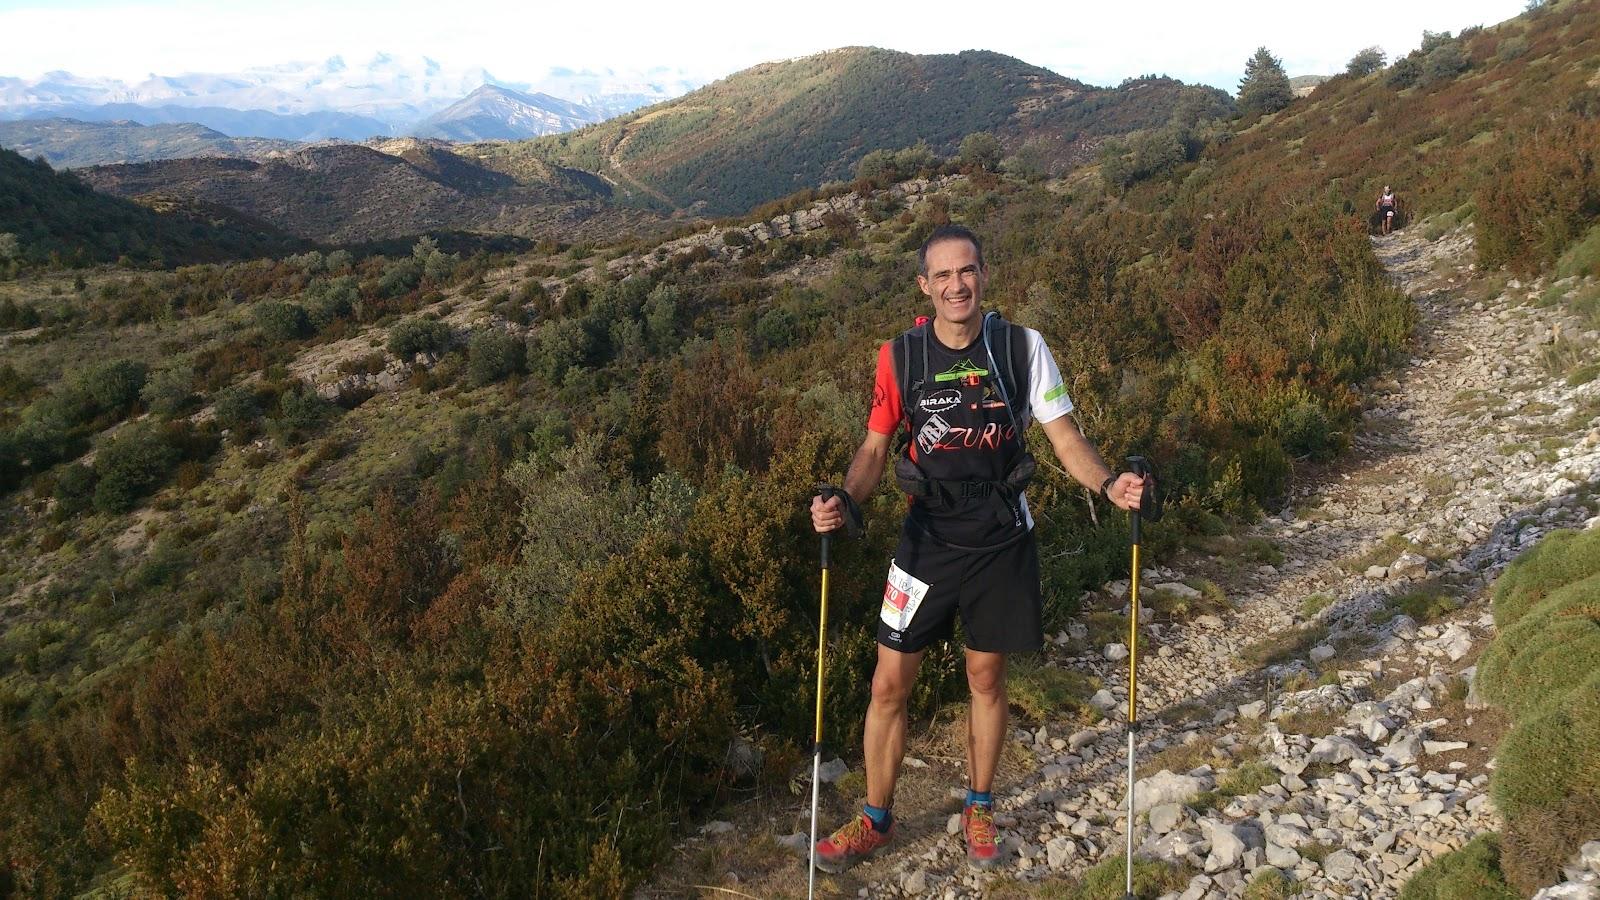 Iron Maiden - Corre Hacia Las Sierras = Run To The Hills